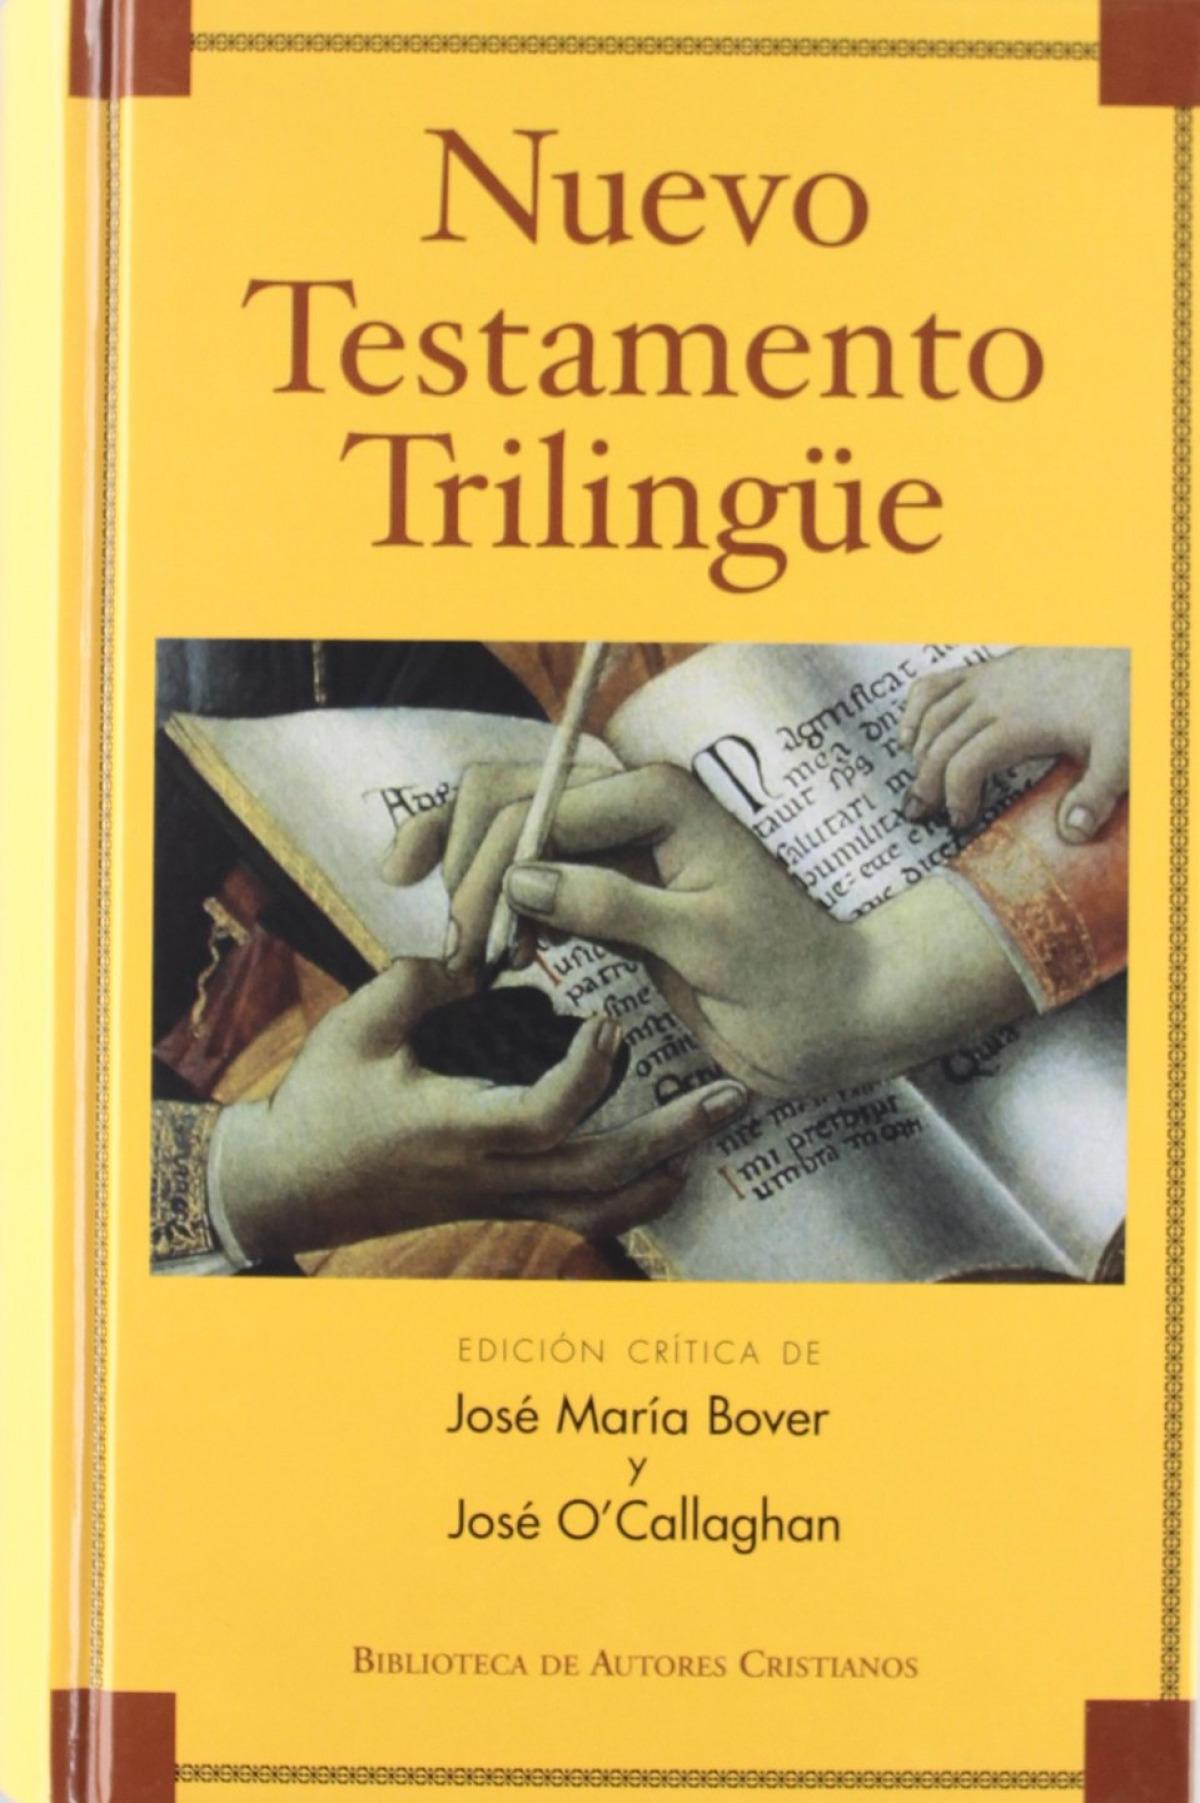 Nuevo Testamento (trilingüe) (NORMAL, Band 400)